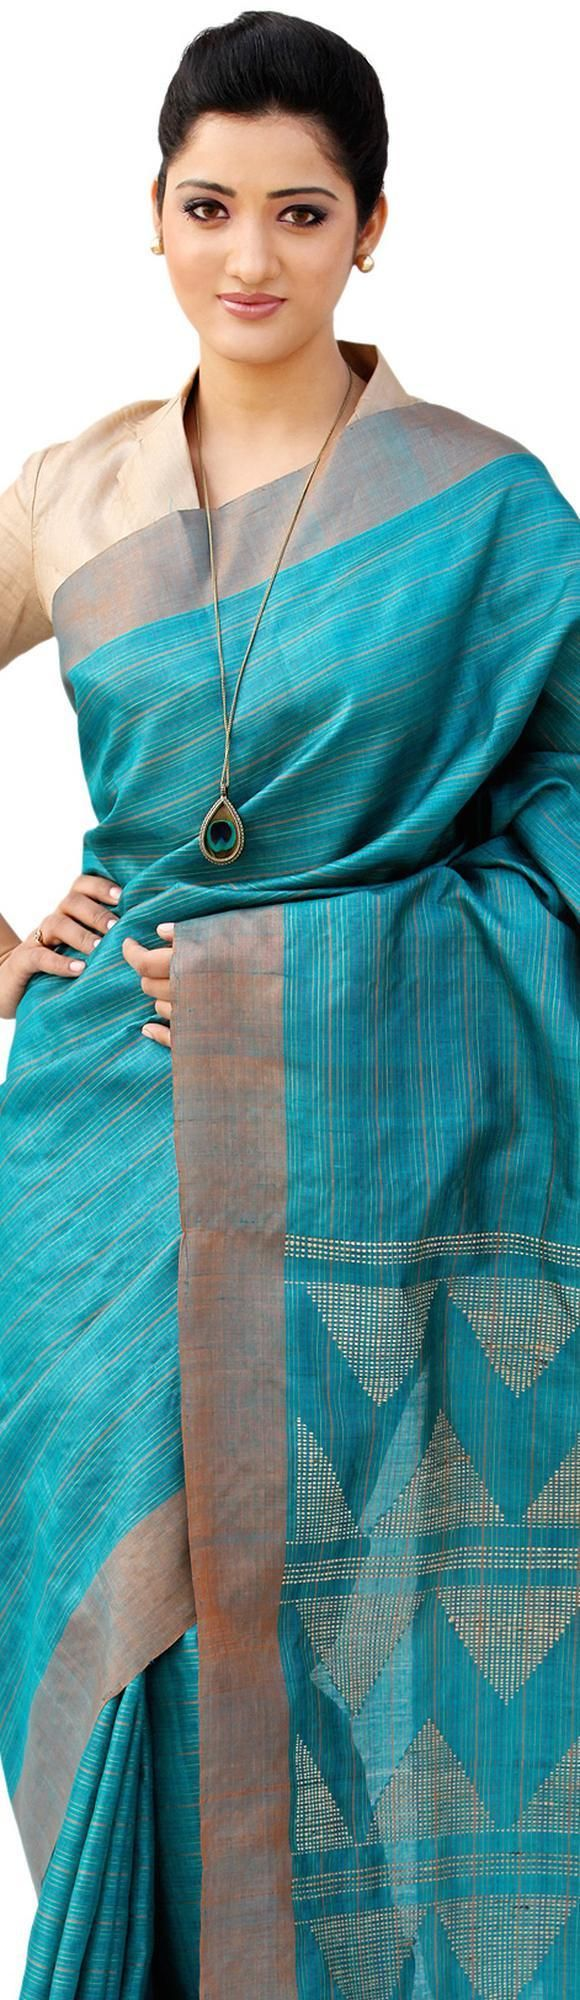 Hand Woven Tussar Saree - original pin by @webjournal